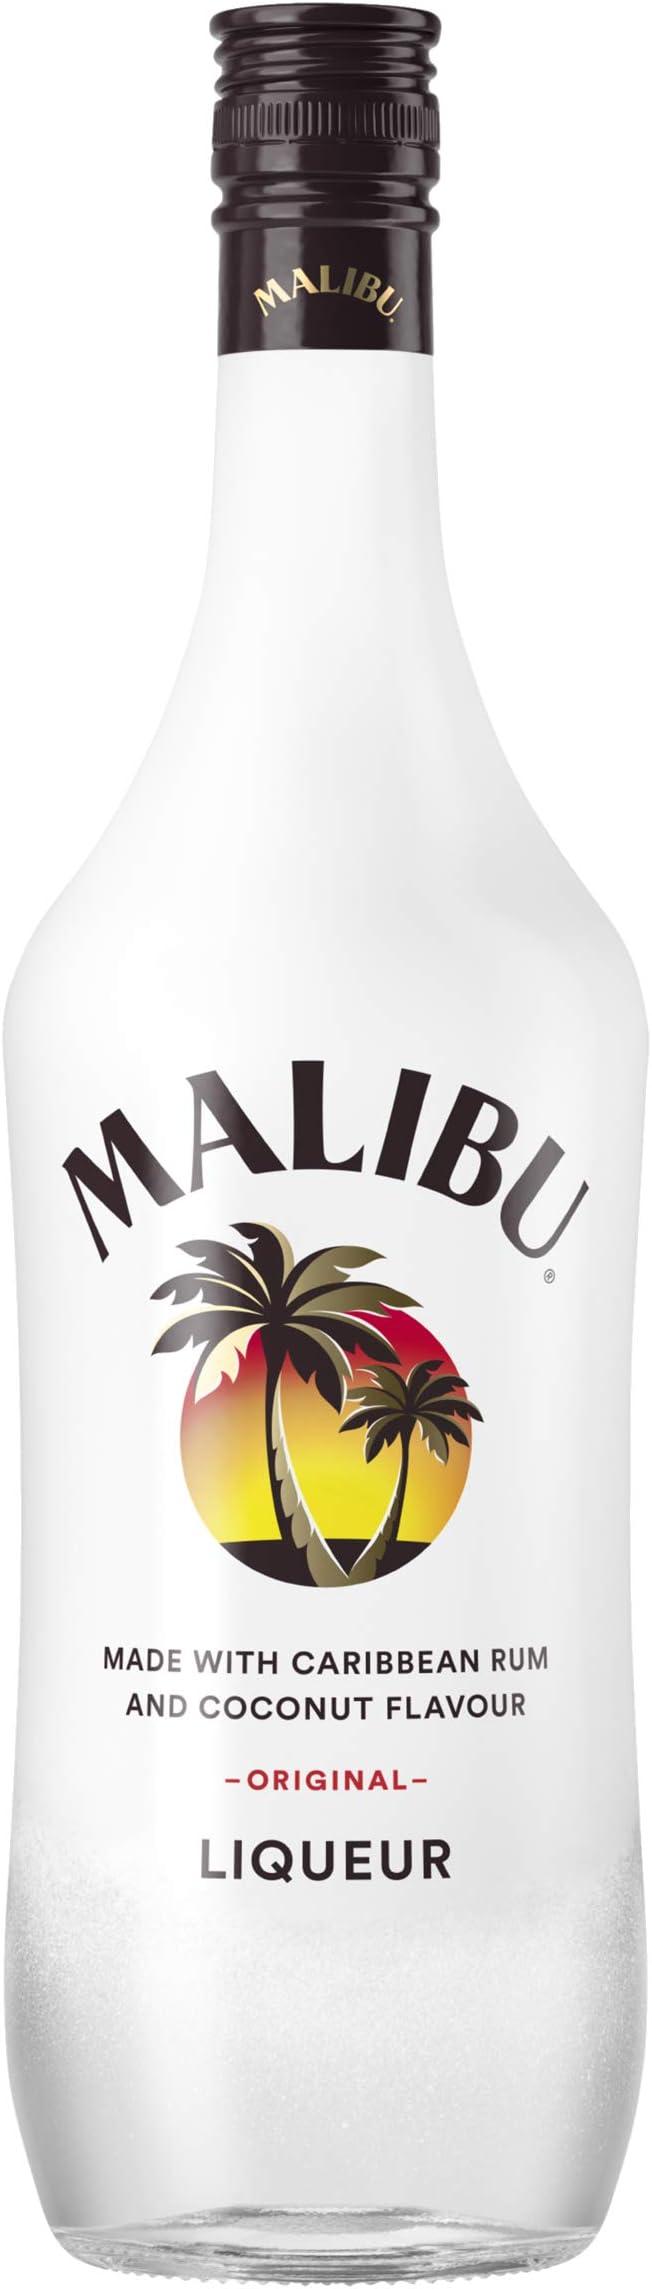 Malibu coconut rum, 1 l 101529237